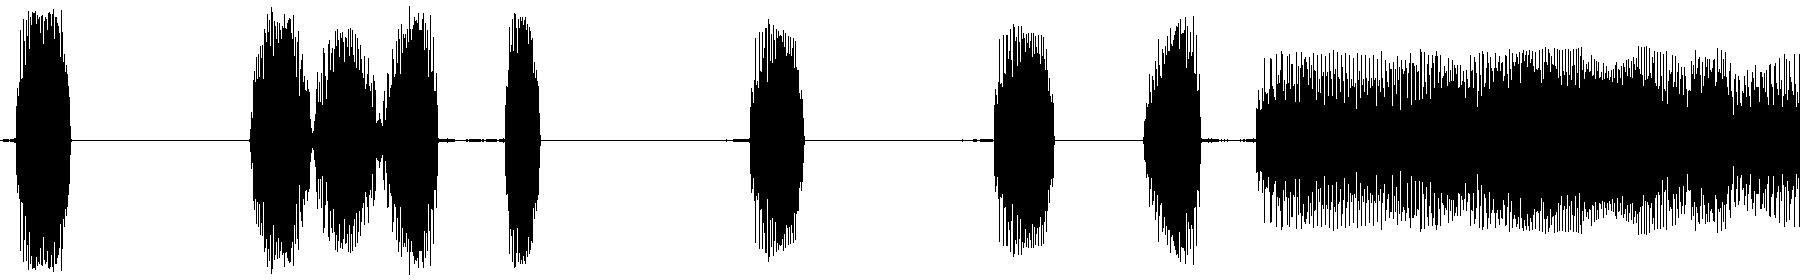 96 scratch loop 02